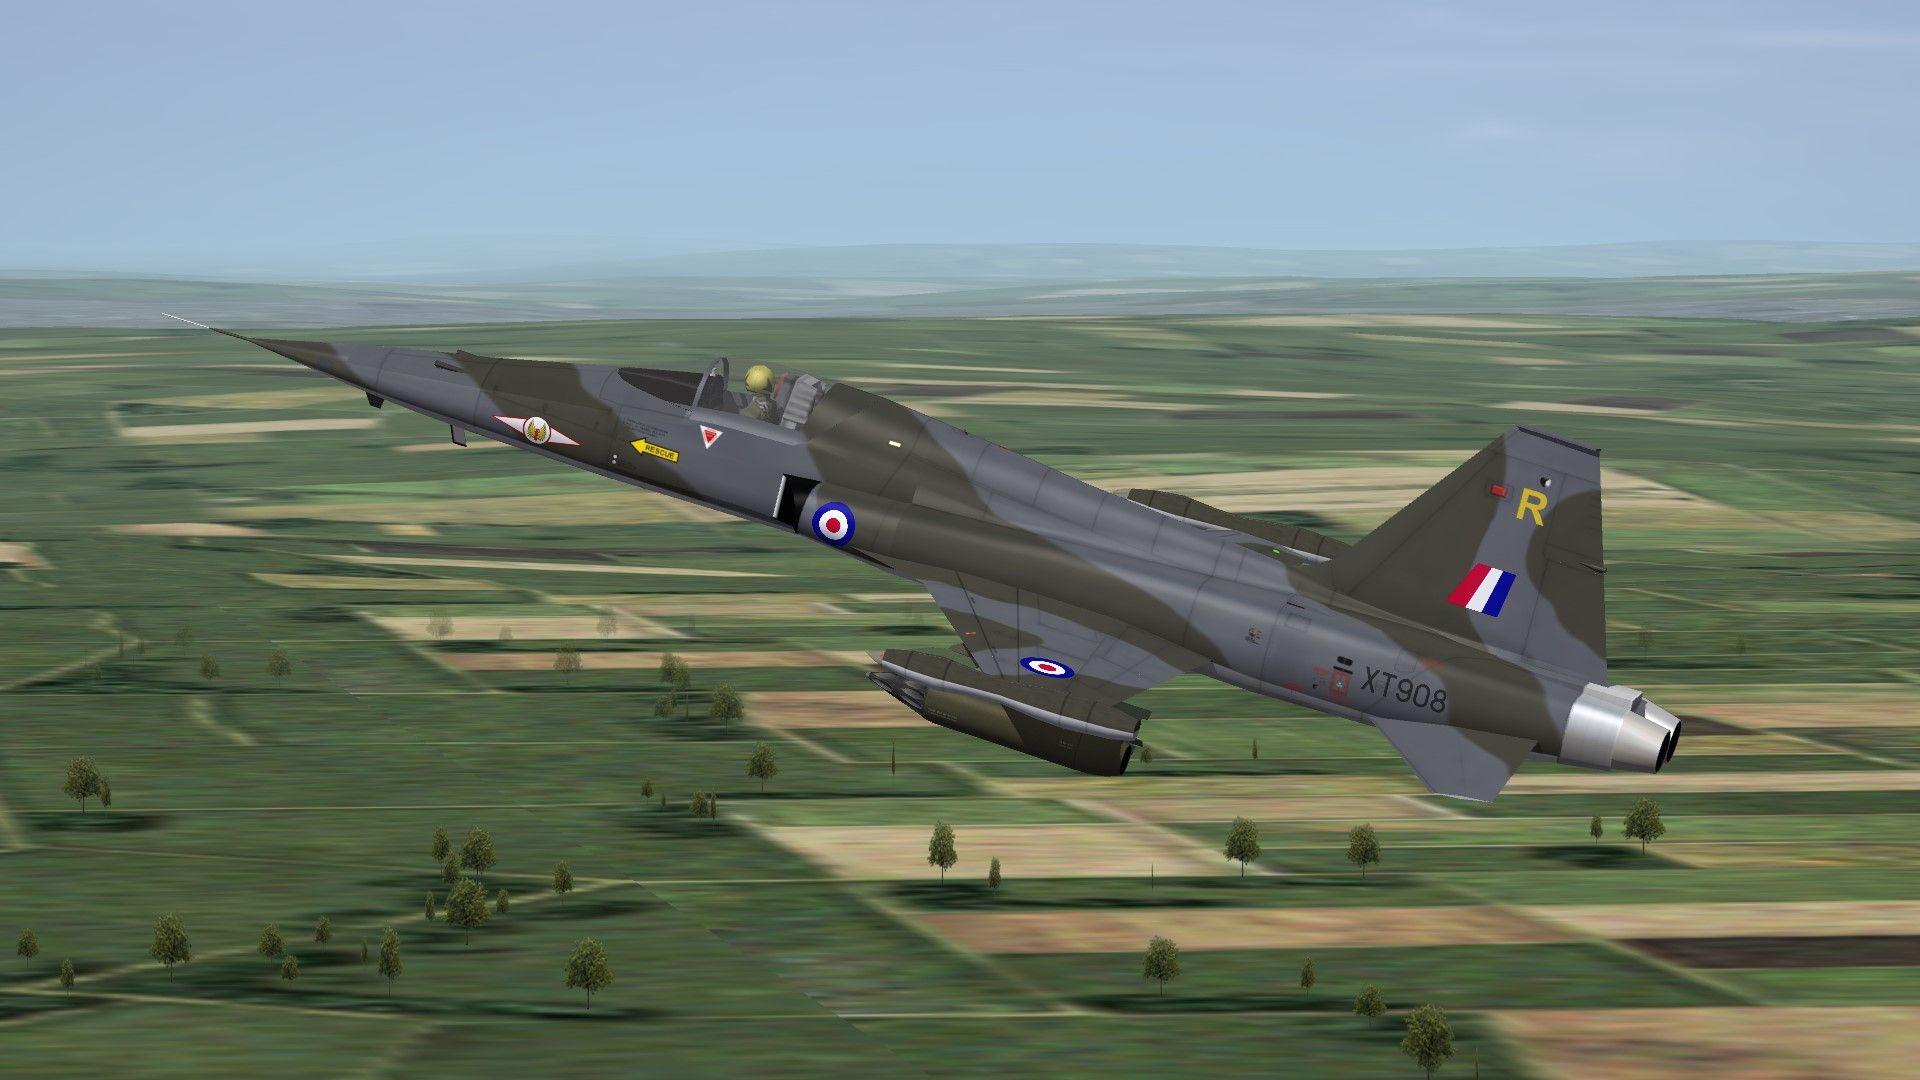 RAFF-5KFREEDOMFIGHTER02_zps44ae32d7.jpg